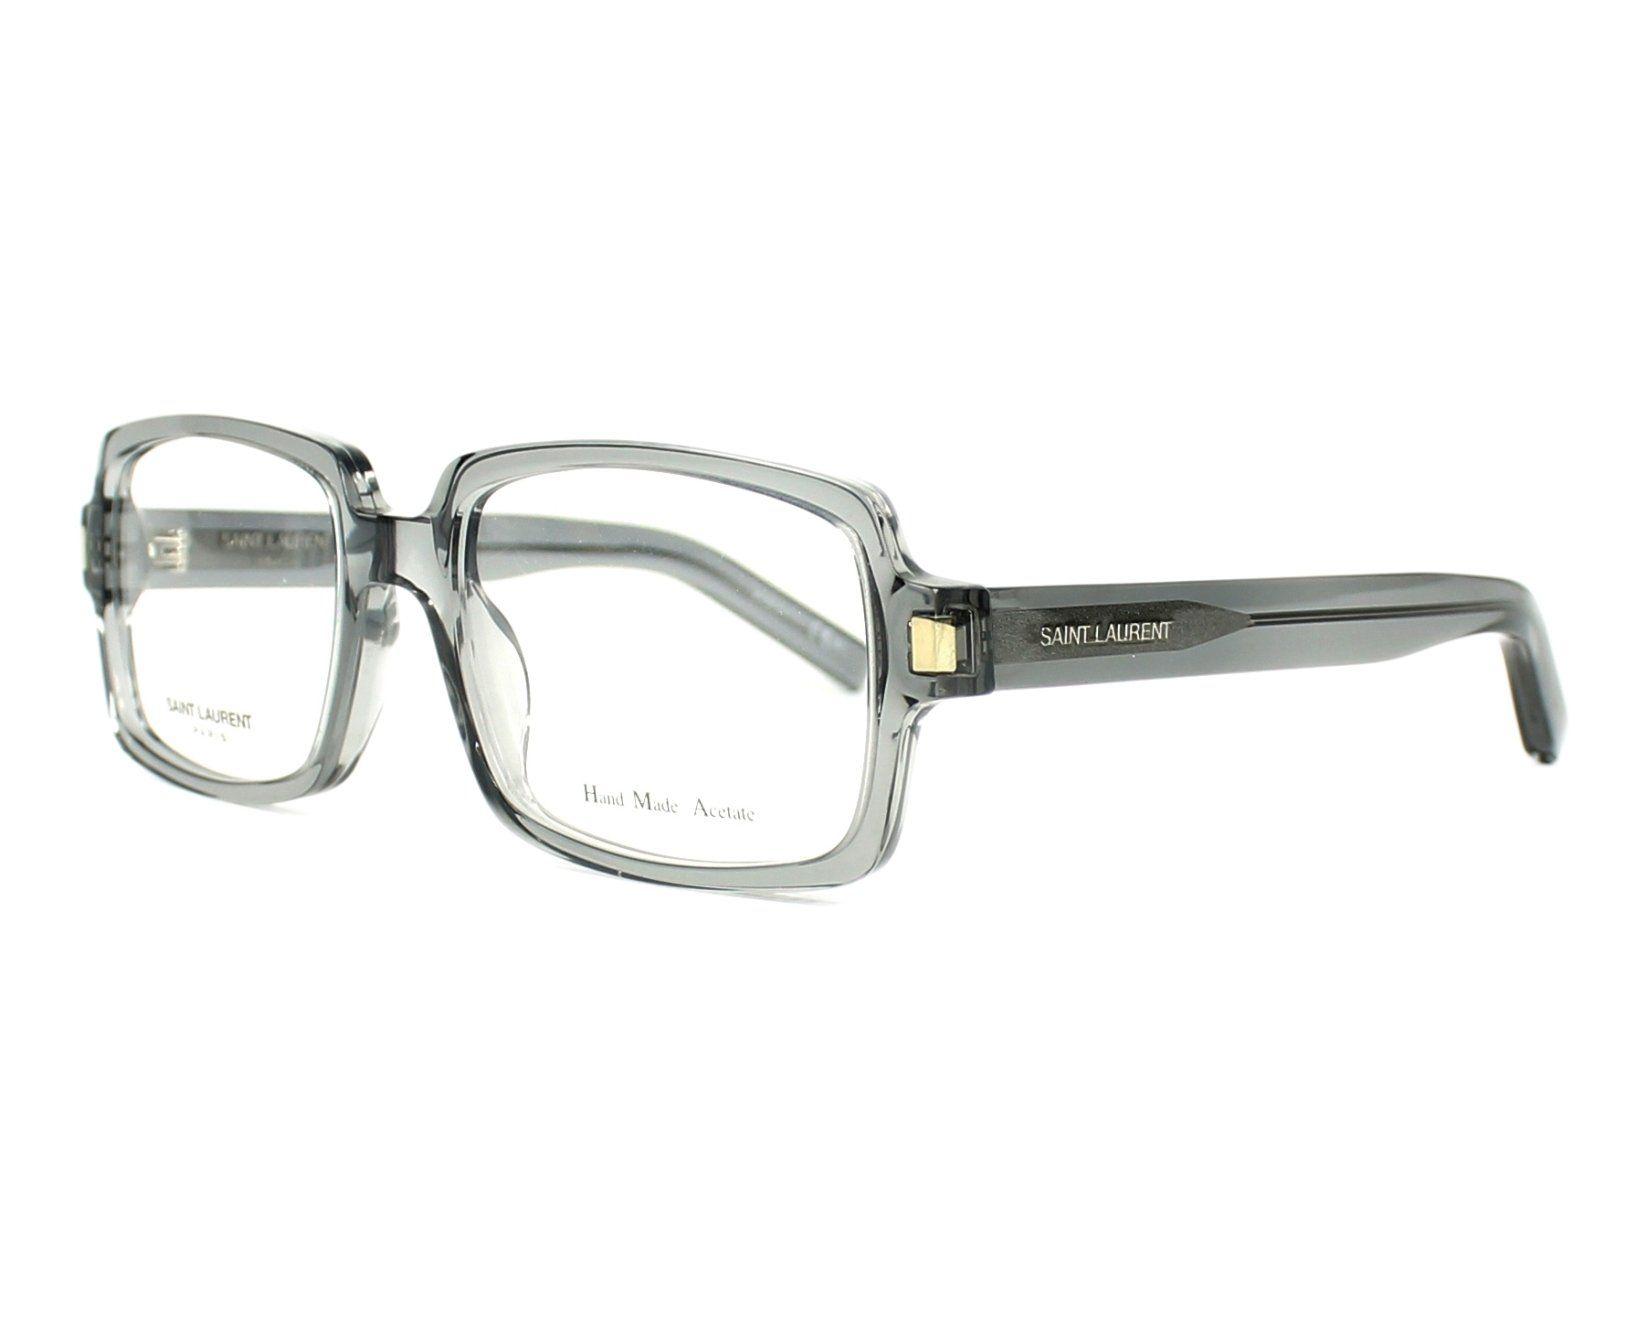 Yves Saint Laurent Brille YSL4030J 086 53 | Visionet | eye style ...